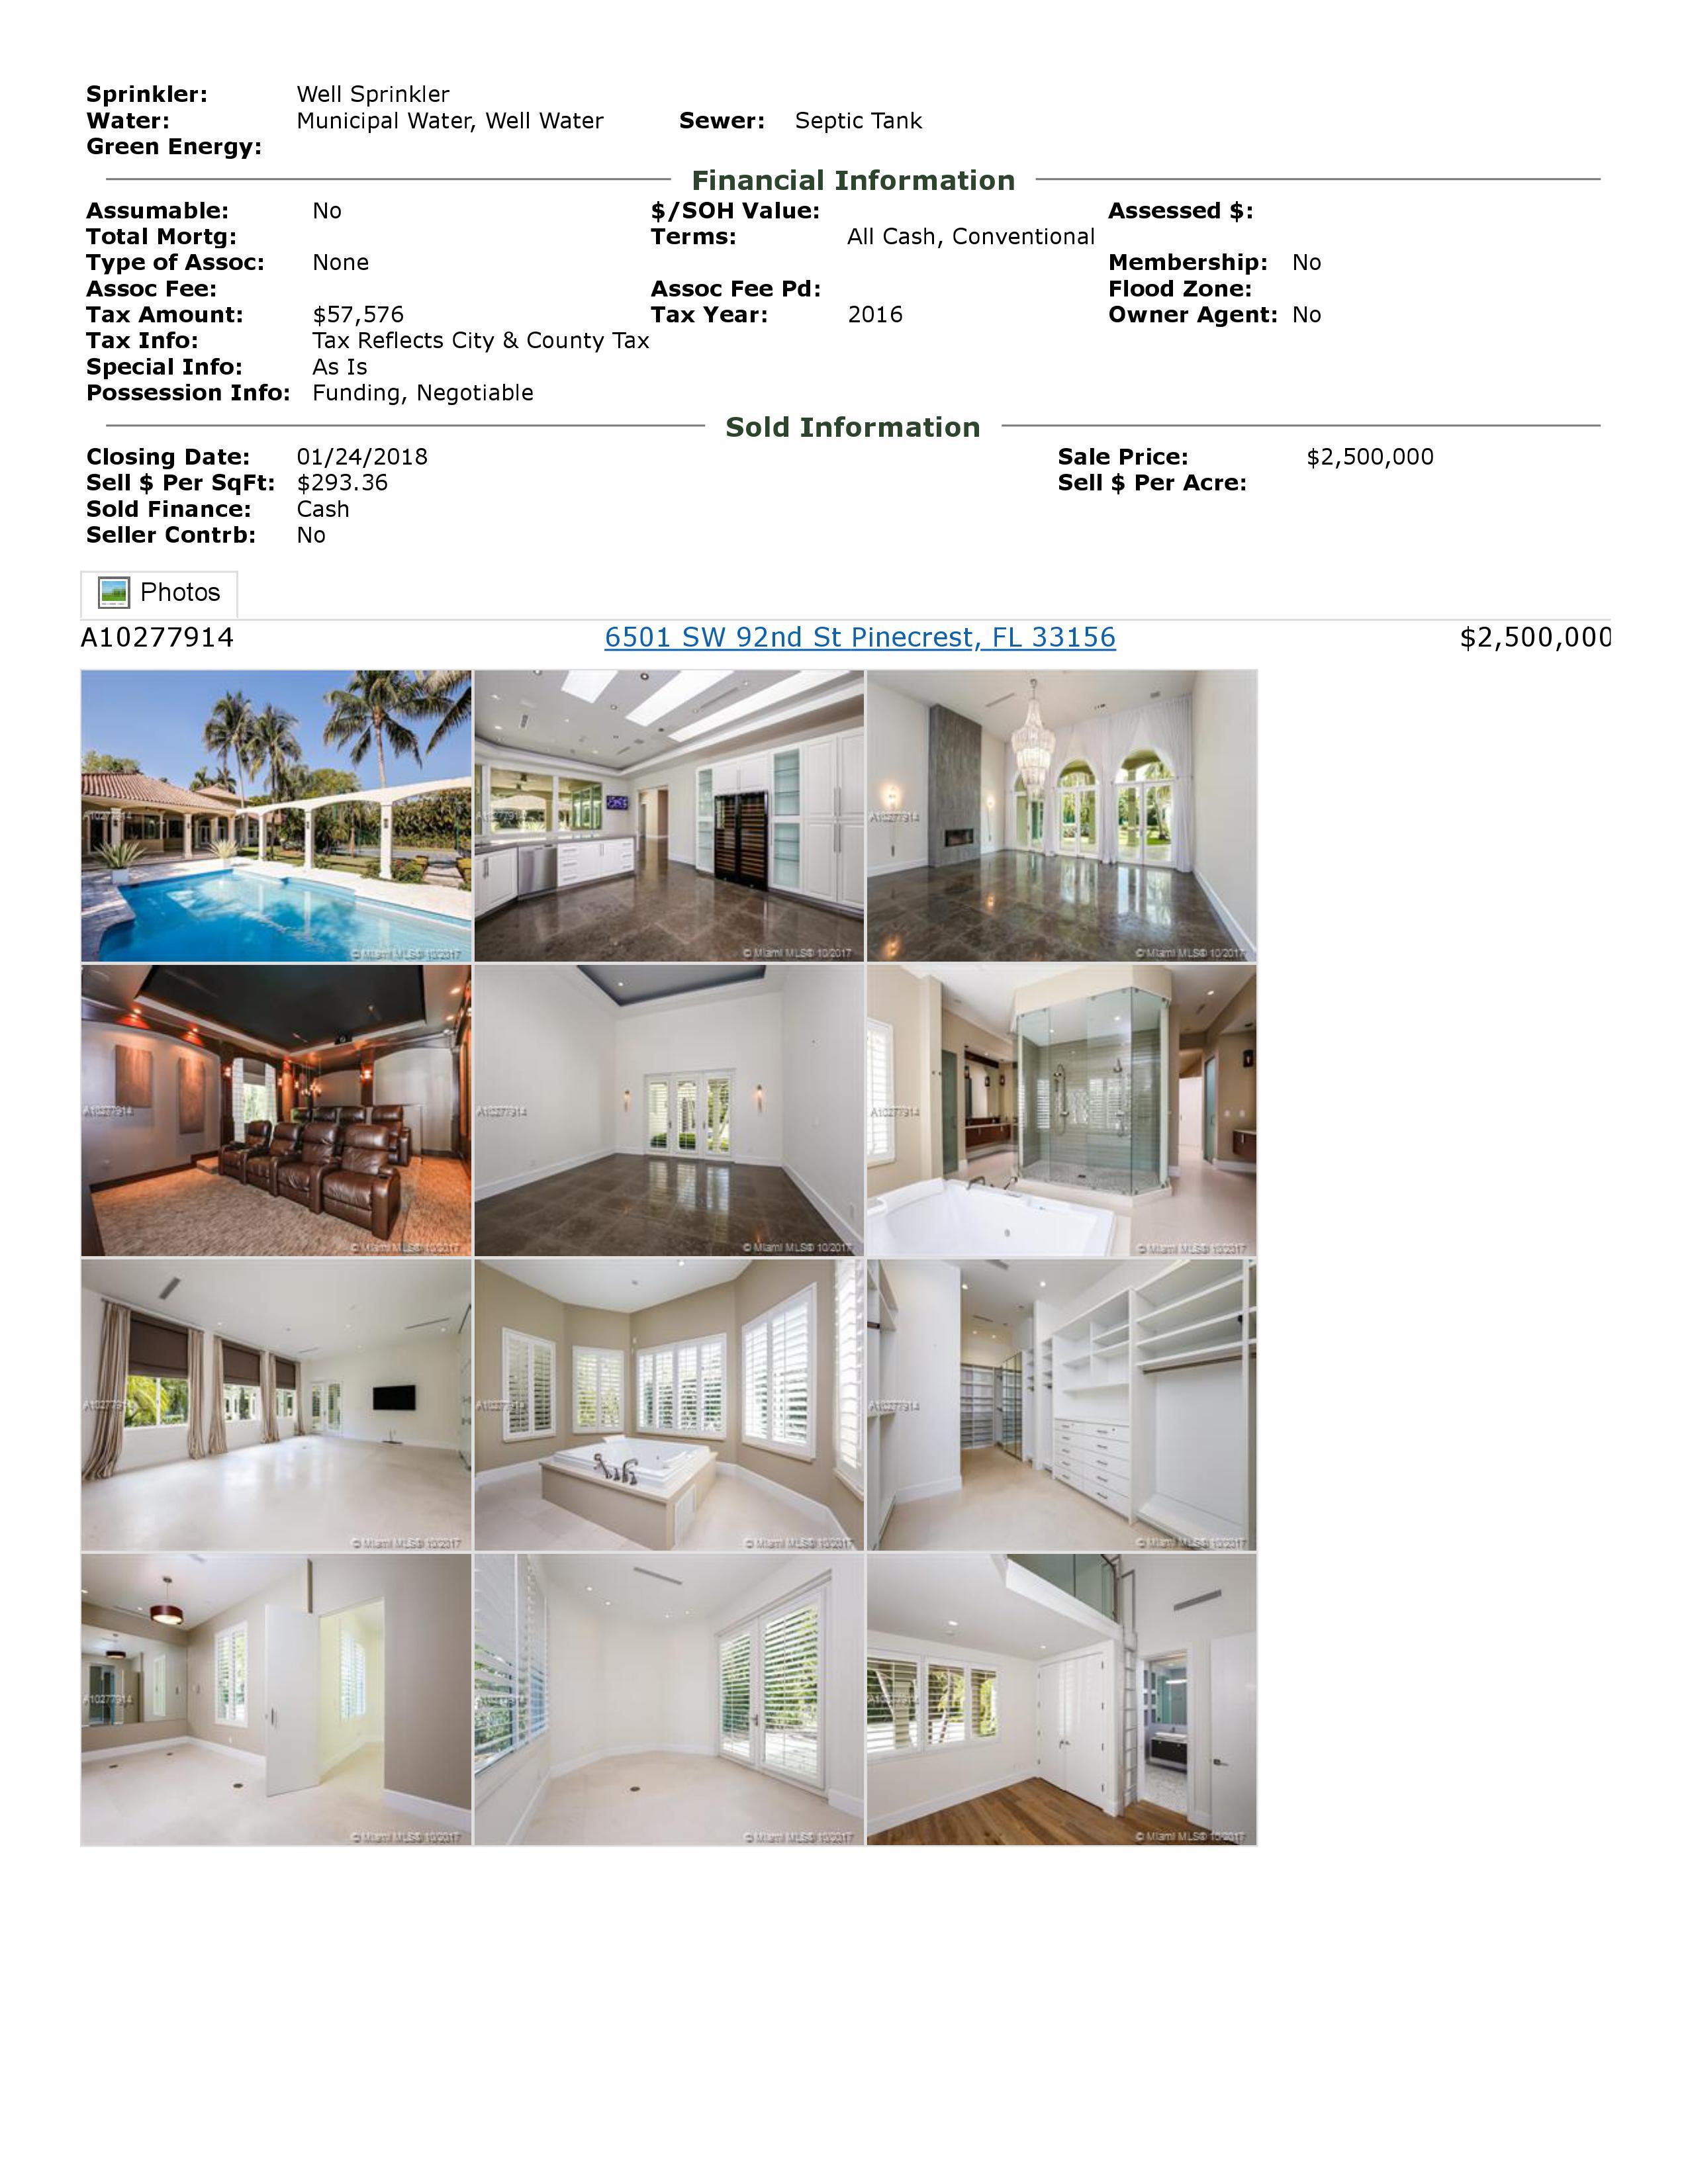 6501 sw 92 street pinecrest florida 33156